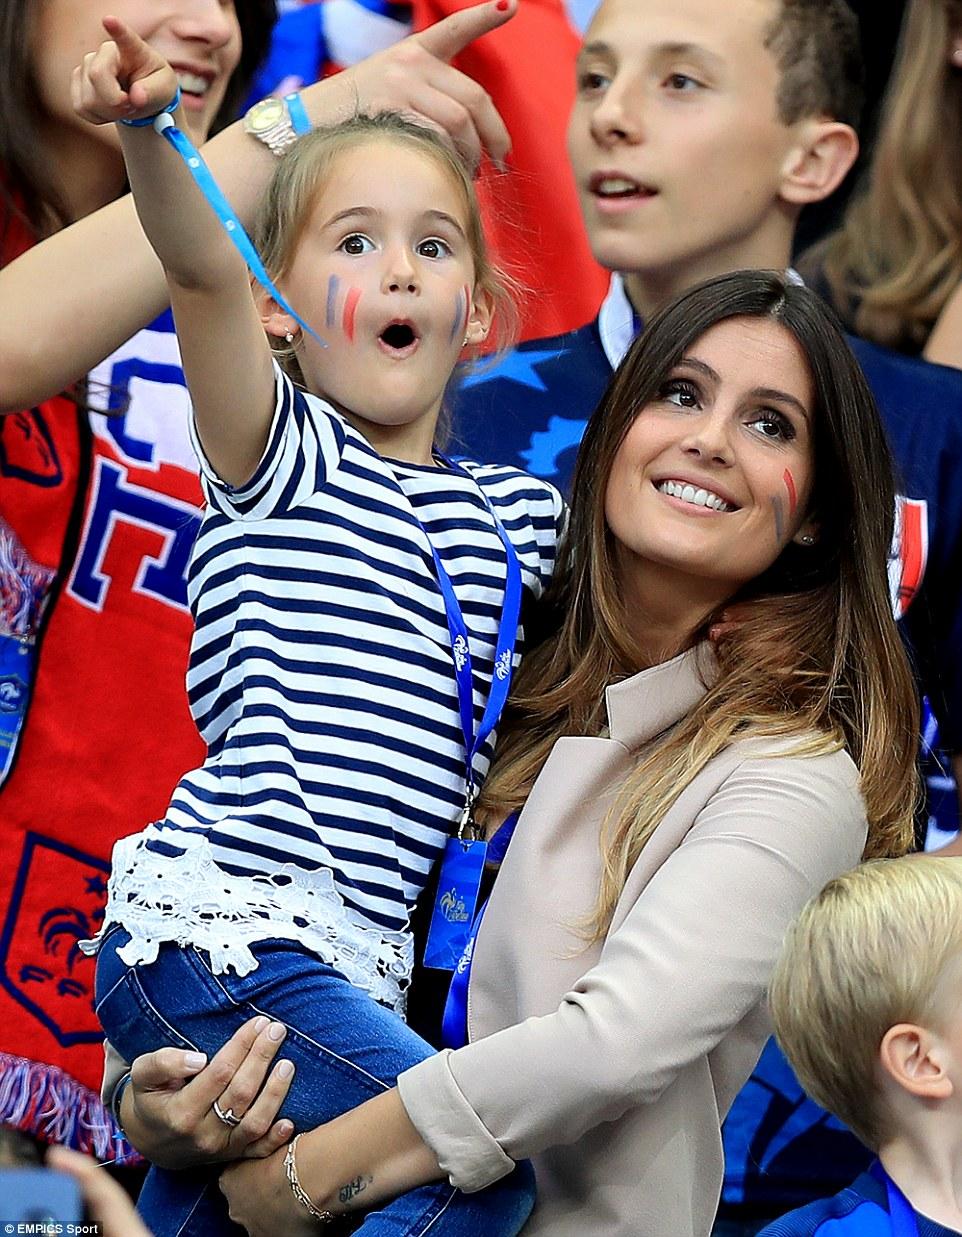 Marine Lloris, the wife of Tottenham Hotspur goalkeeper Hugo Lloris, smiles as she watches France beat Romania in their Euro 2016 clash